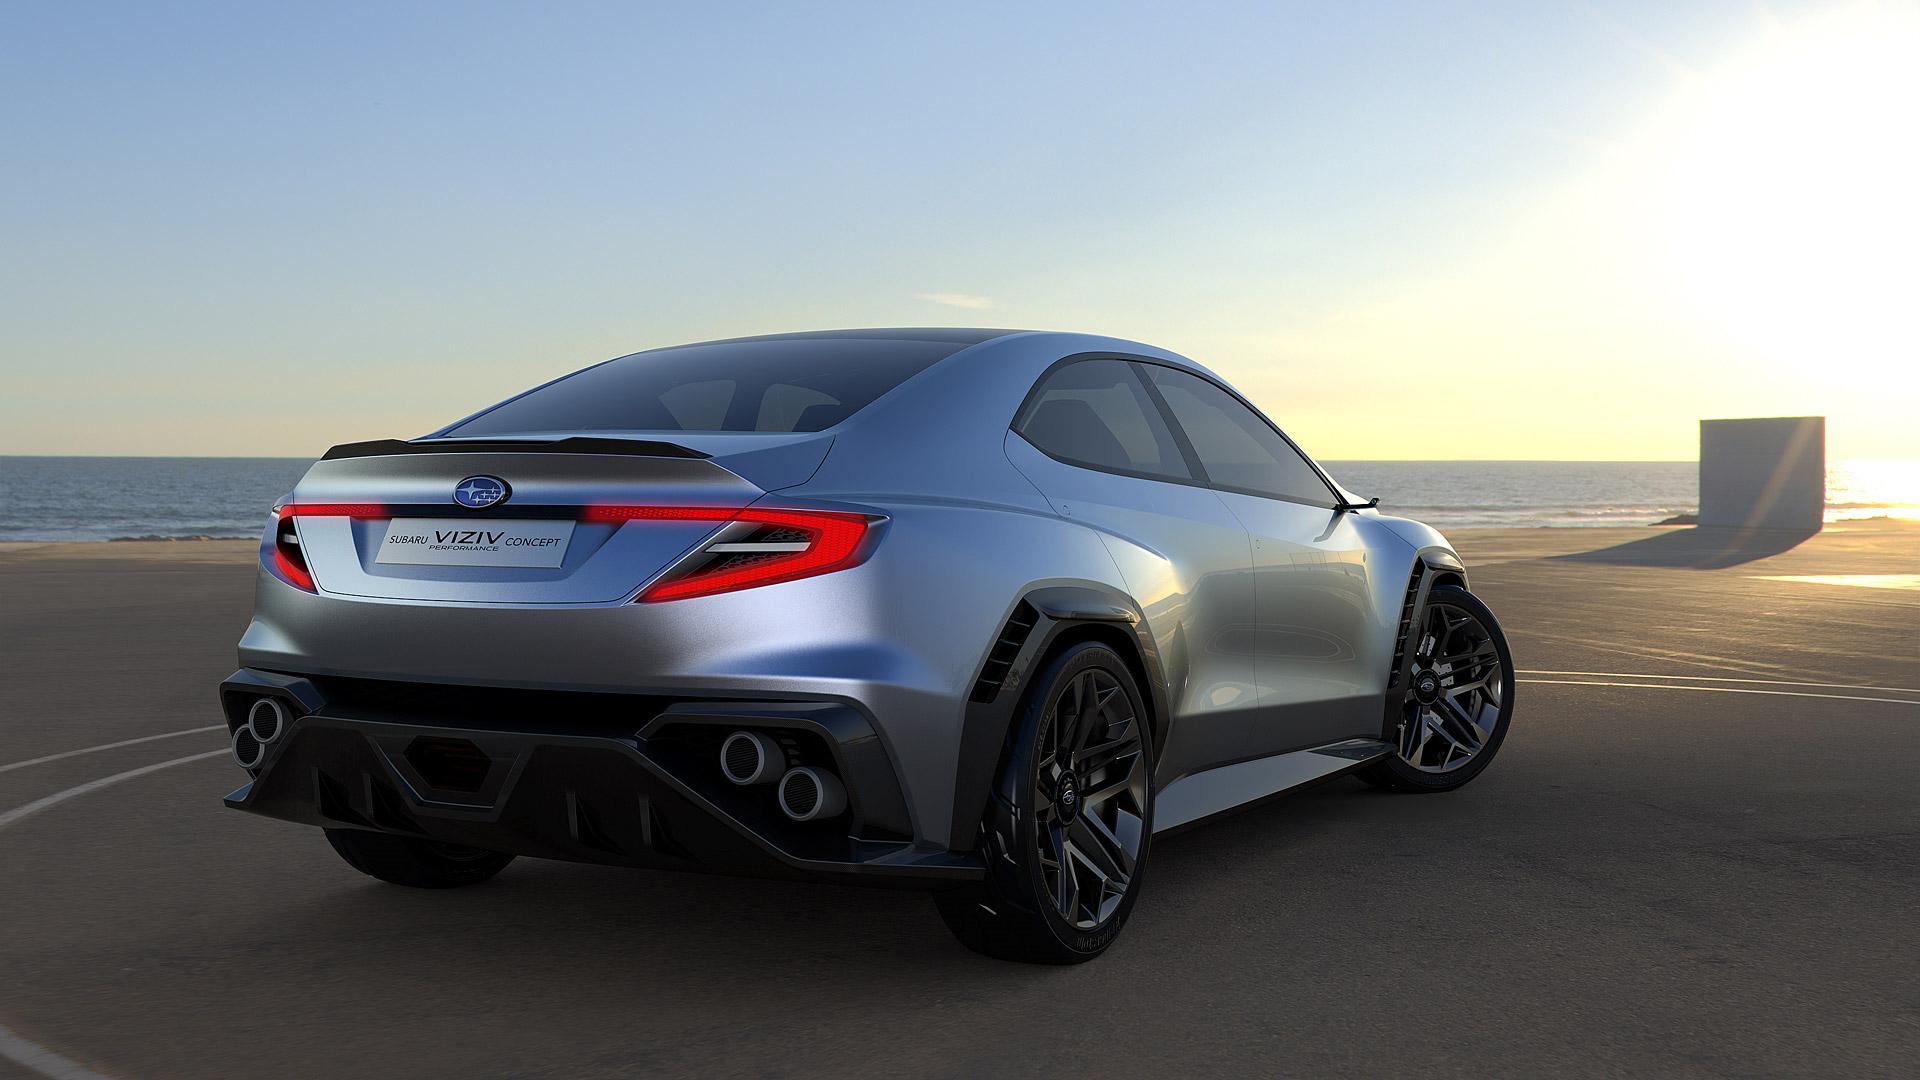 2017 Subaru Viziv Performance Concept Hd Wallpaper